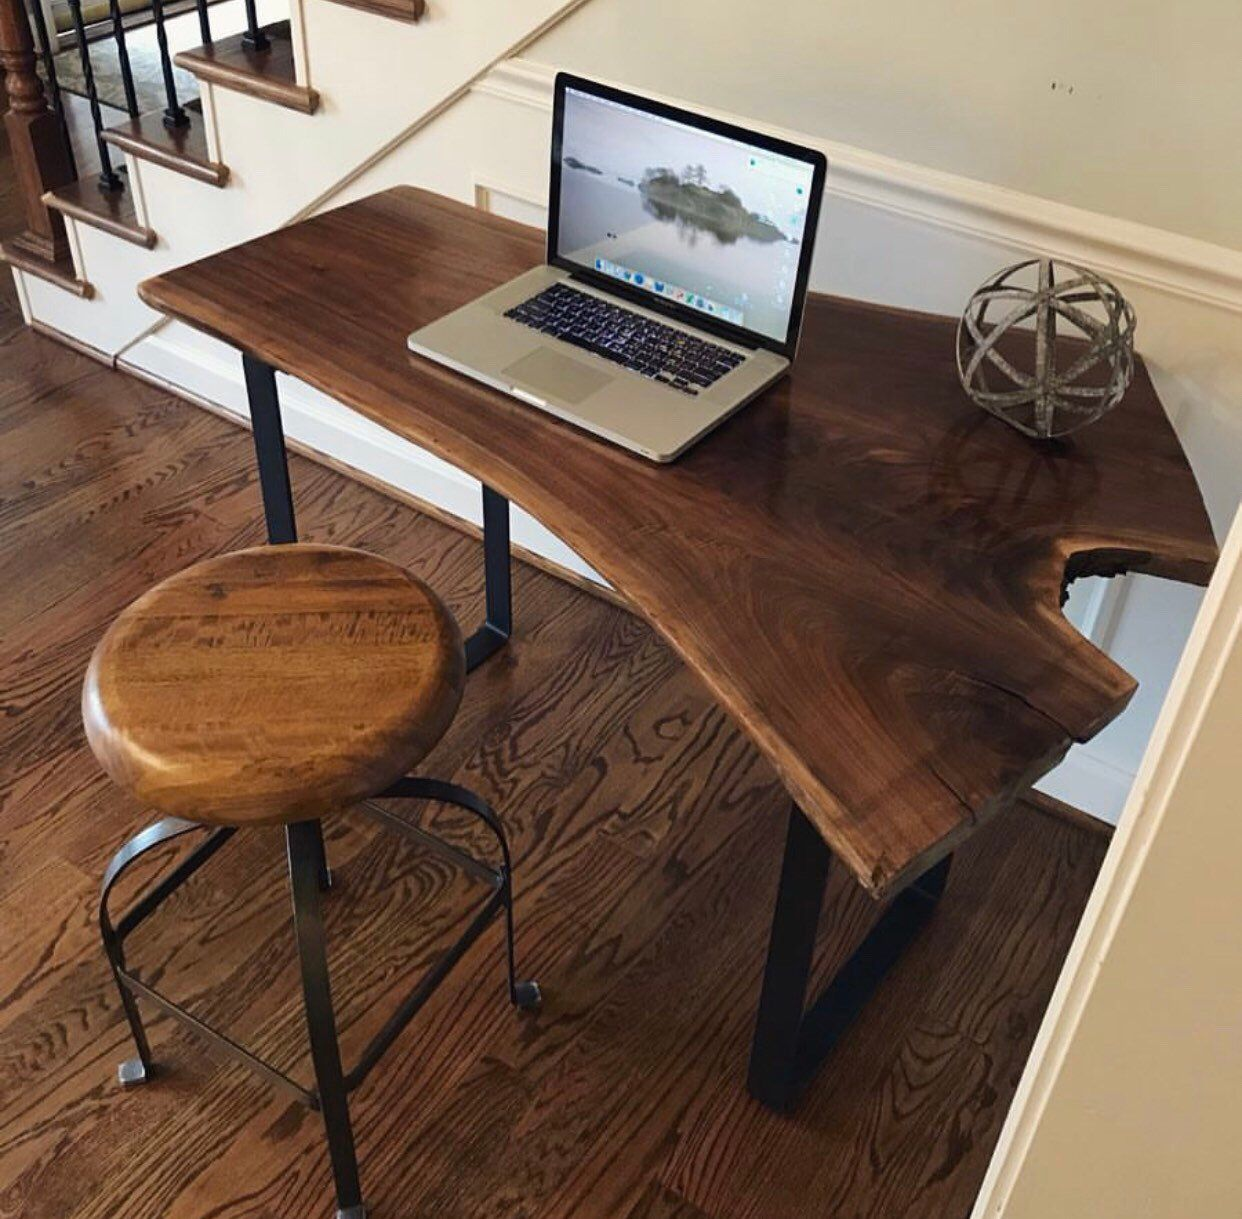 Custom Black Walnut Desk Live Edge Desk Walnut Desk Computer Desk Live Edge Slab Slab Desk Walnut Table By Allth Live Edge Desk Walnut Desks Slab Desk